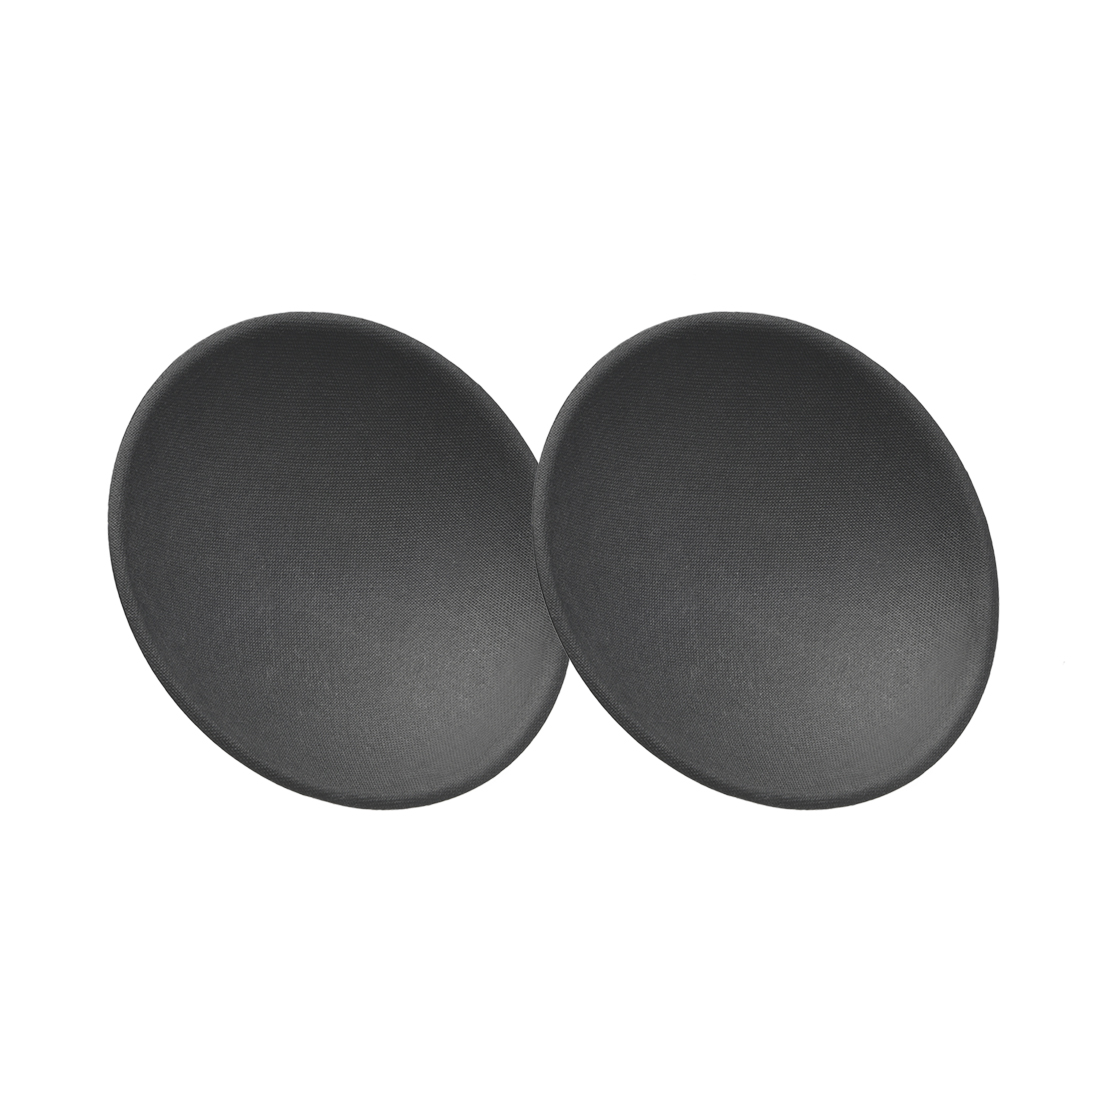 "Speaker Dust Cap 130mm/5.1"" Diameter Subwoofer Paper Dome Coil Cover Caps 2 Pcs"